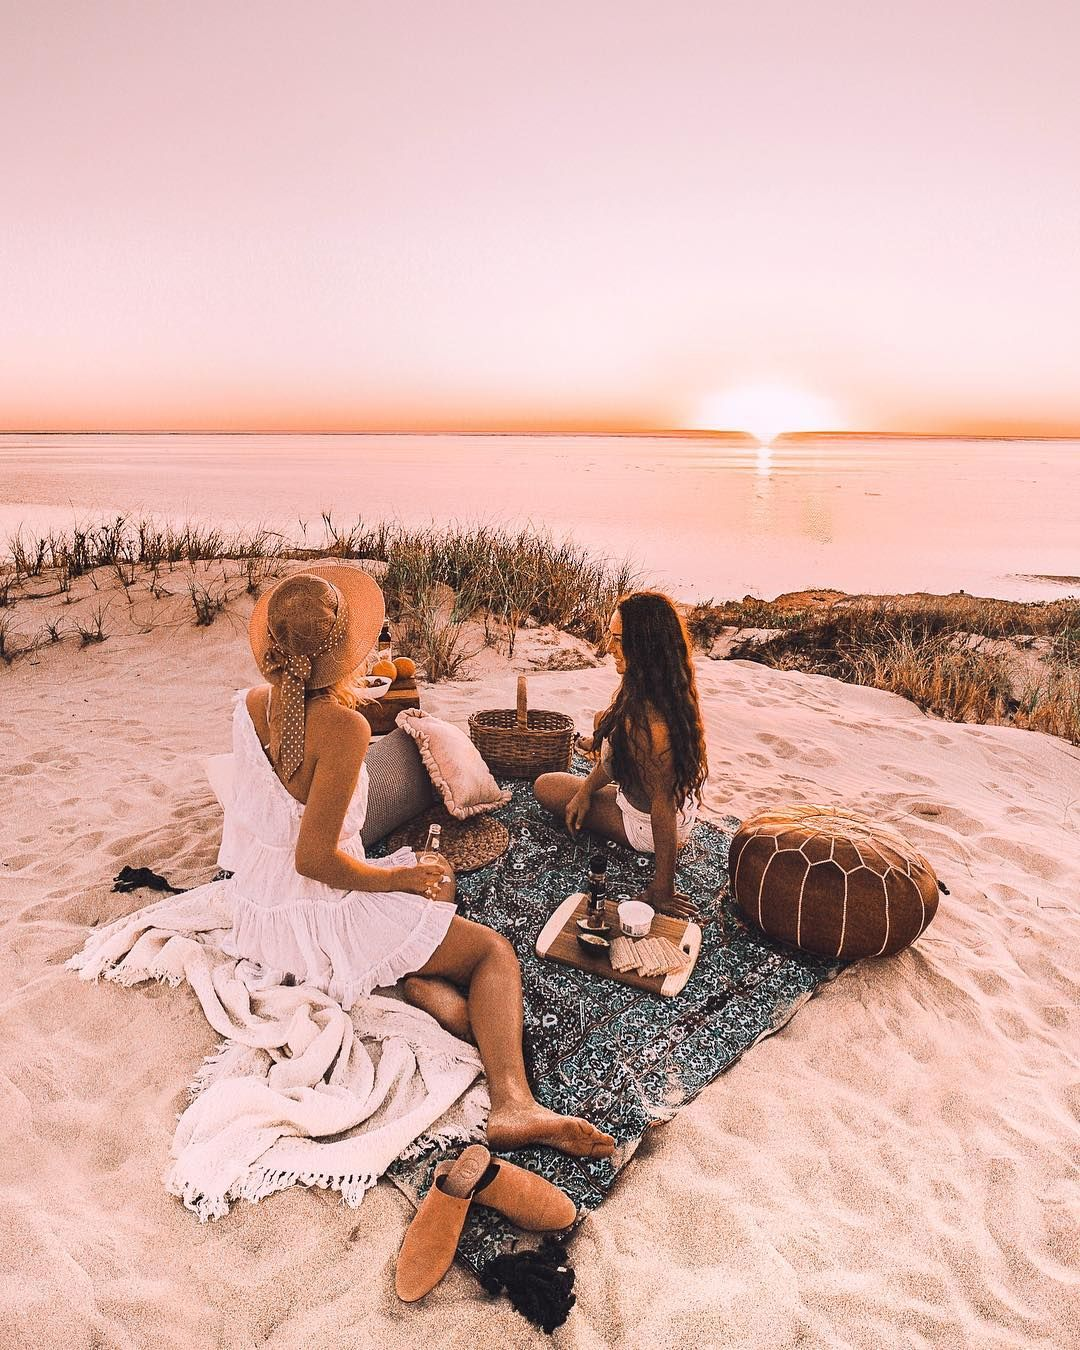 b06d50560dfb Alohas Sandals - Alex Pink Pale  sandals  alohassandals  aloha  summer   summeroutfit  travel  madeinspain